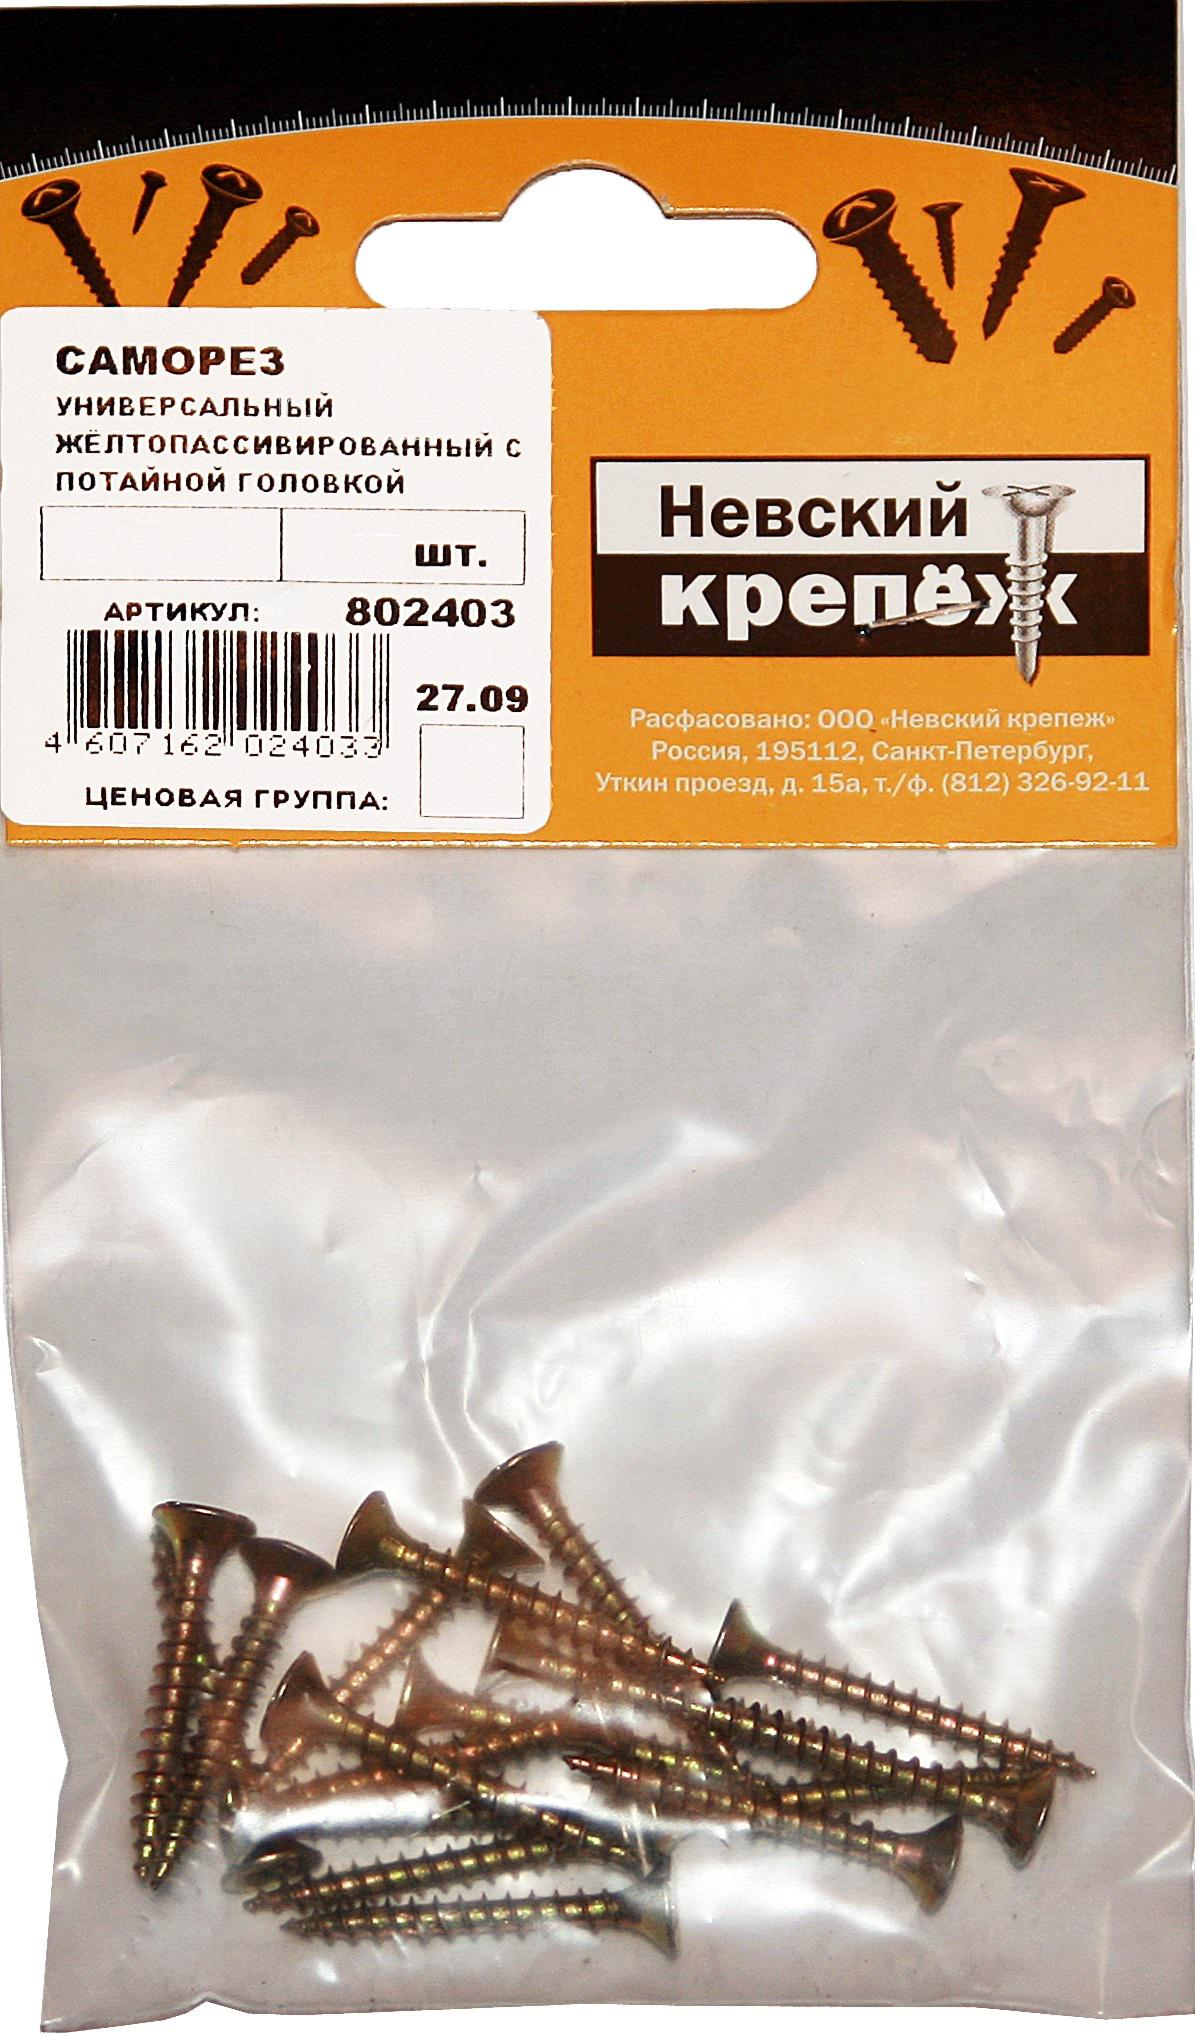 Саморез НЕВСКИЙ КРЕПЕЖ 802394